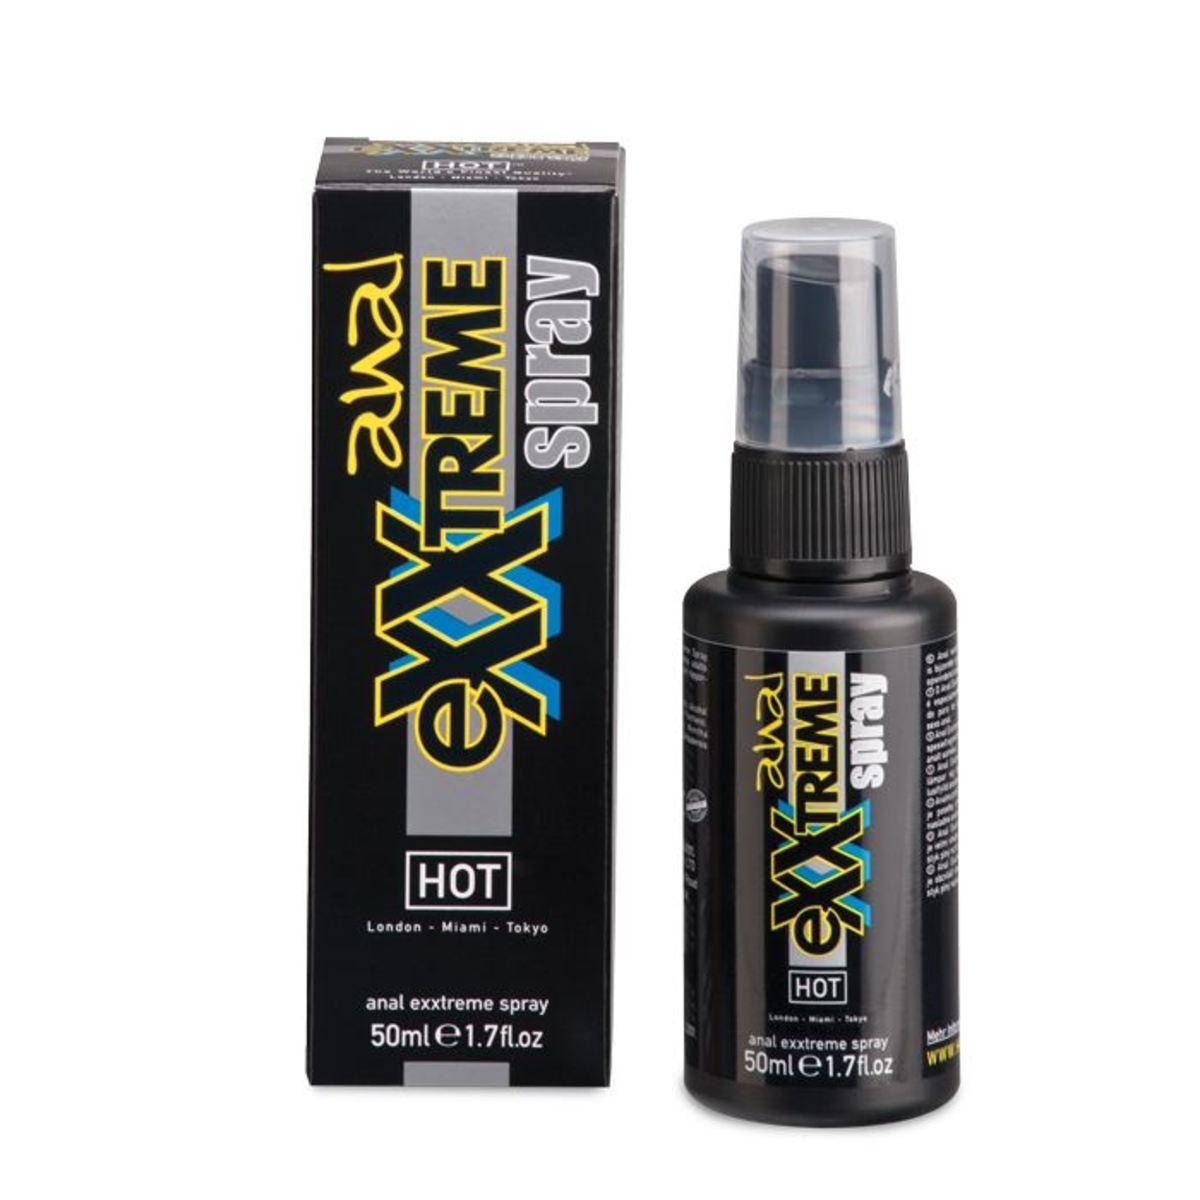 Hot eXXtreme Anal Spray 50ml